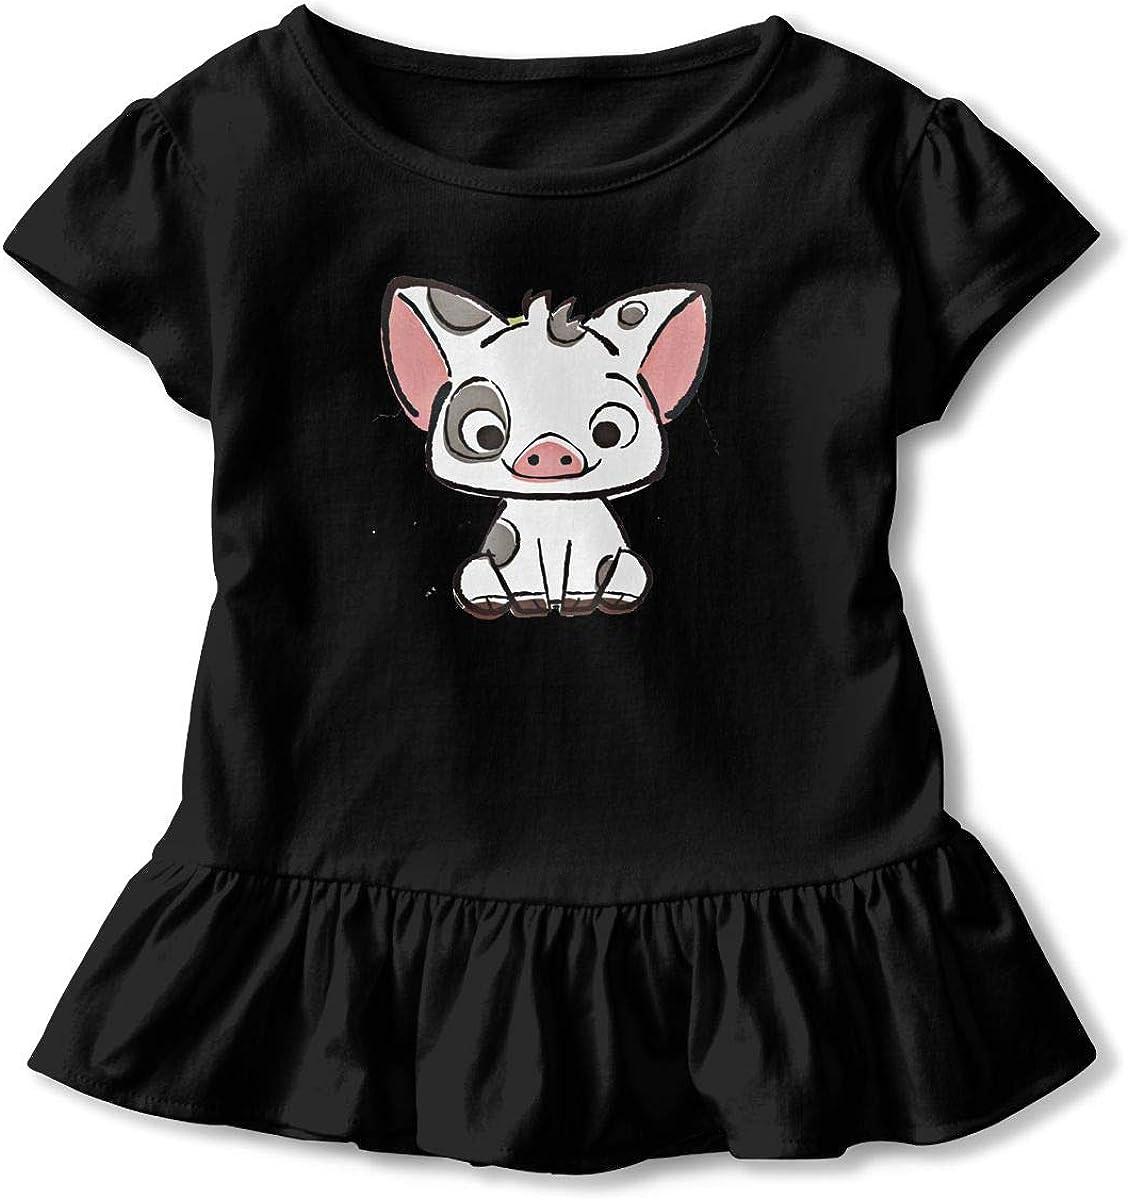 Flamingo Playing Soccer Art Toddler Baby Newborn Short Sleeve Tee Shirt 6-24 Month Cotton Tops